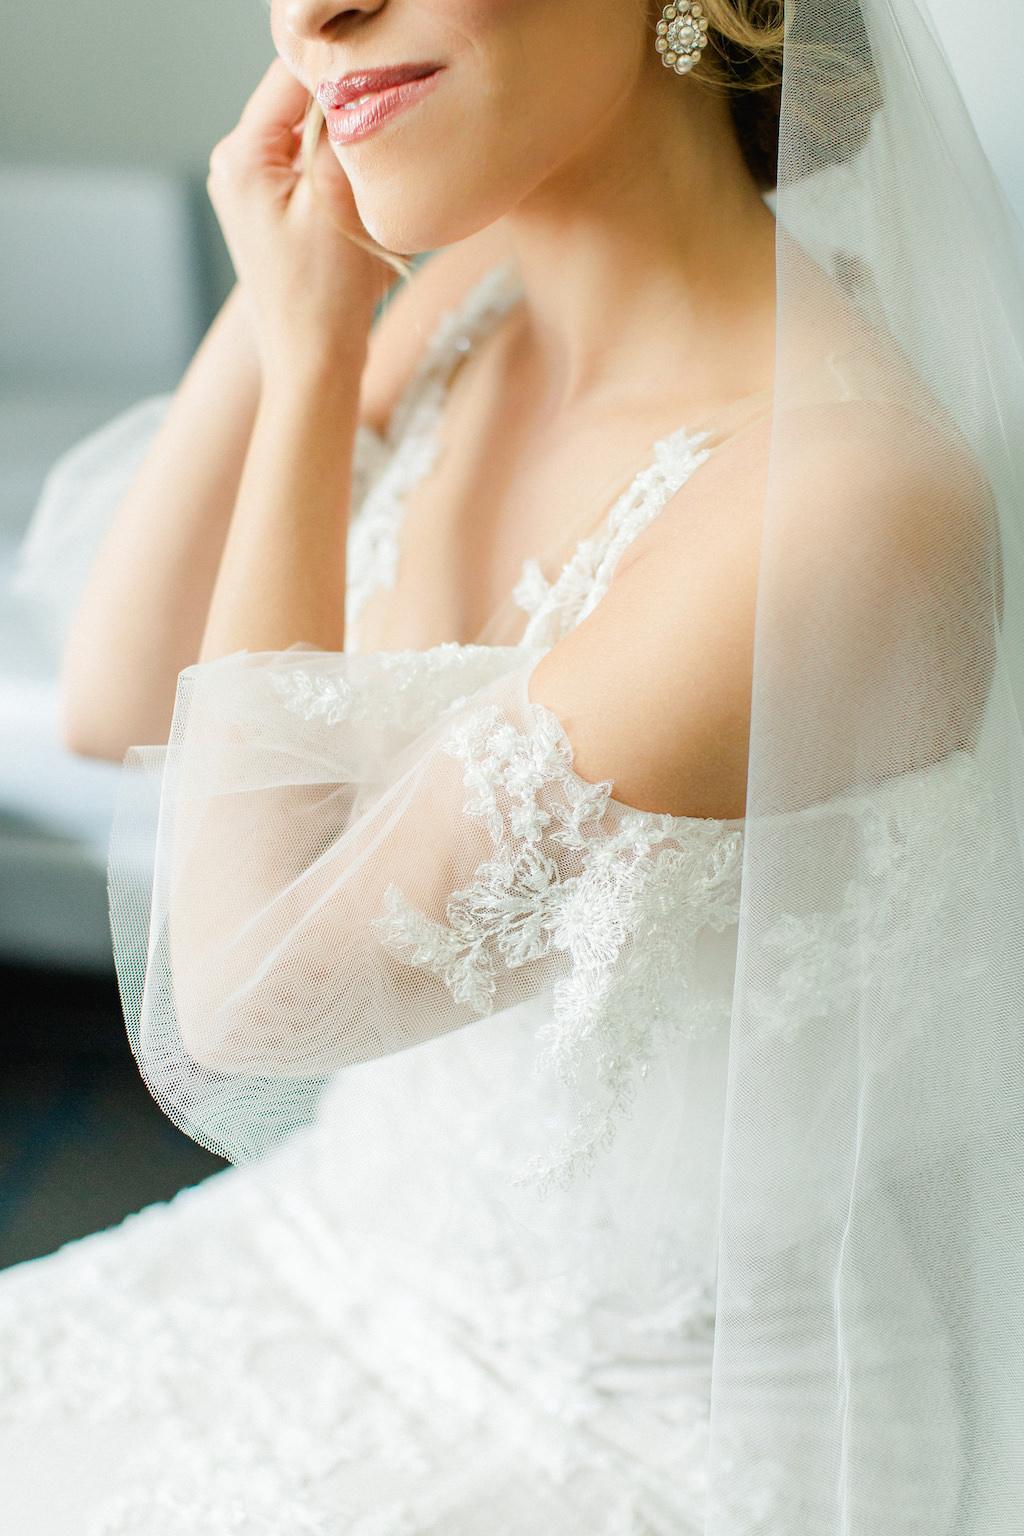 Tampa Bay Bride Getting Ready Wedding Portrait, Putting on Earrings